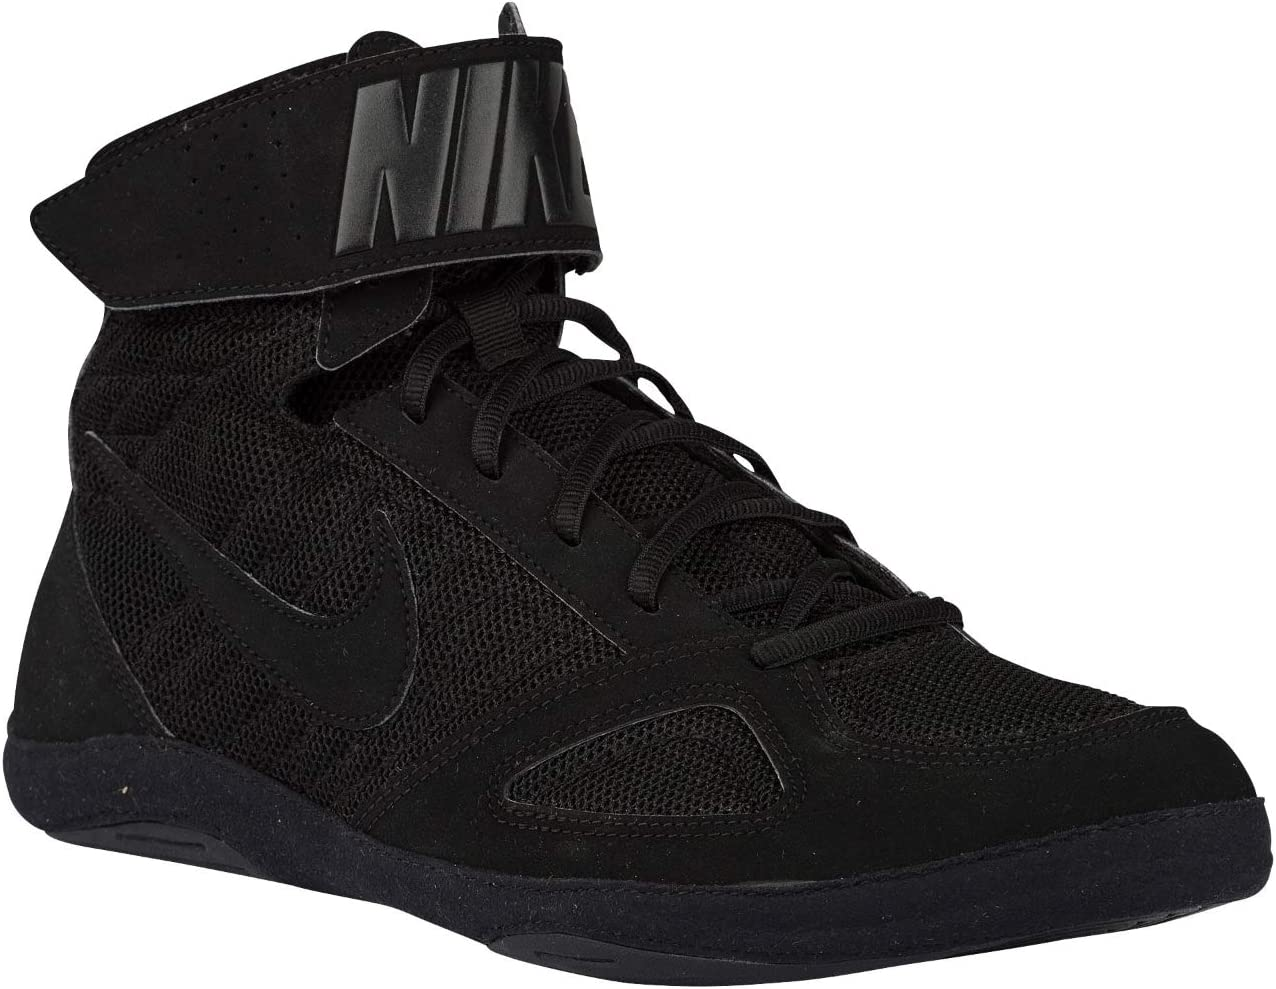 Vacante llamar zona  Amazon.com: Nike Takedown 4: Automotive